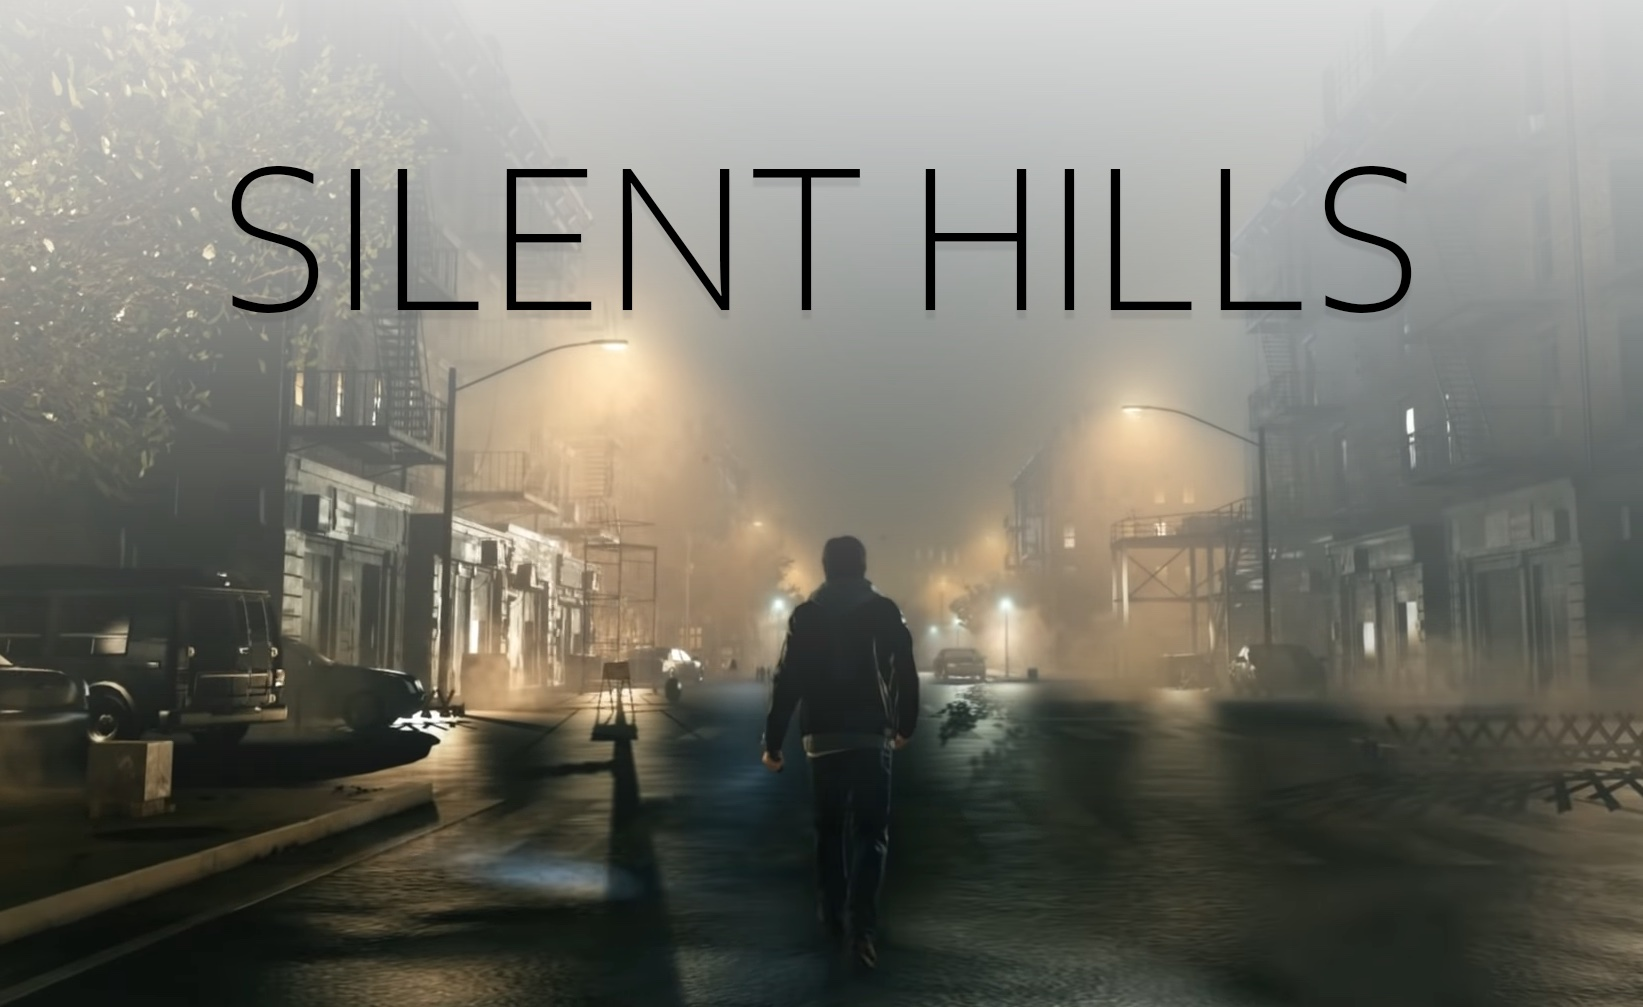 СМИ: Хидео Кодзима все же делает Silent Hill для PS5